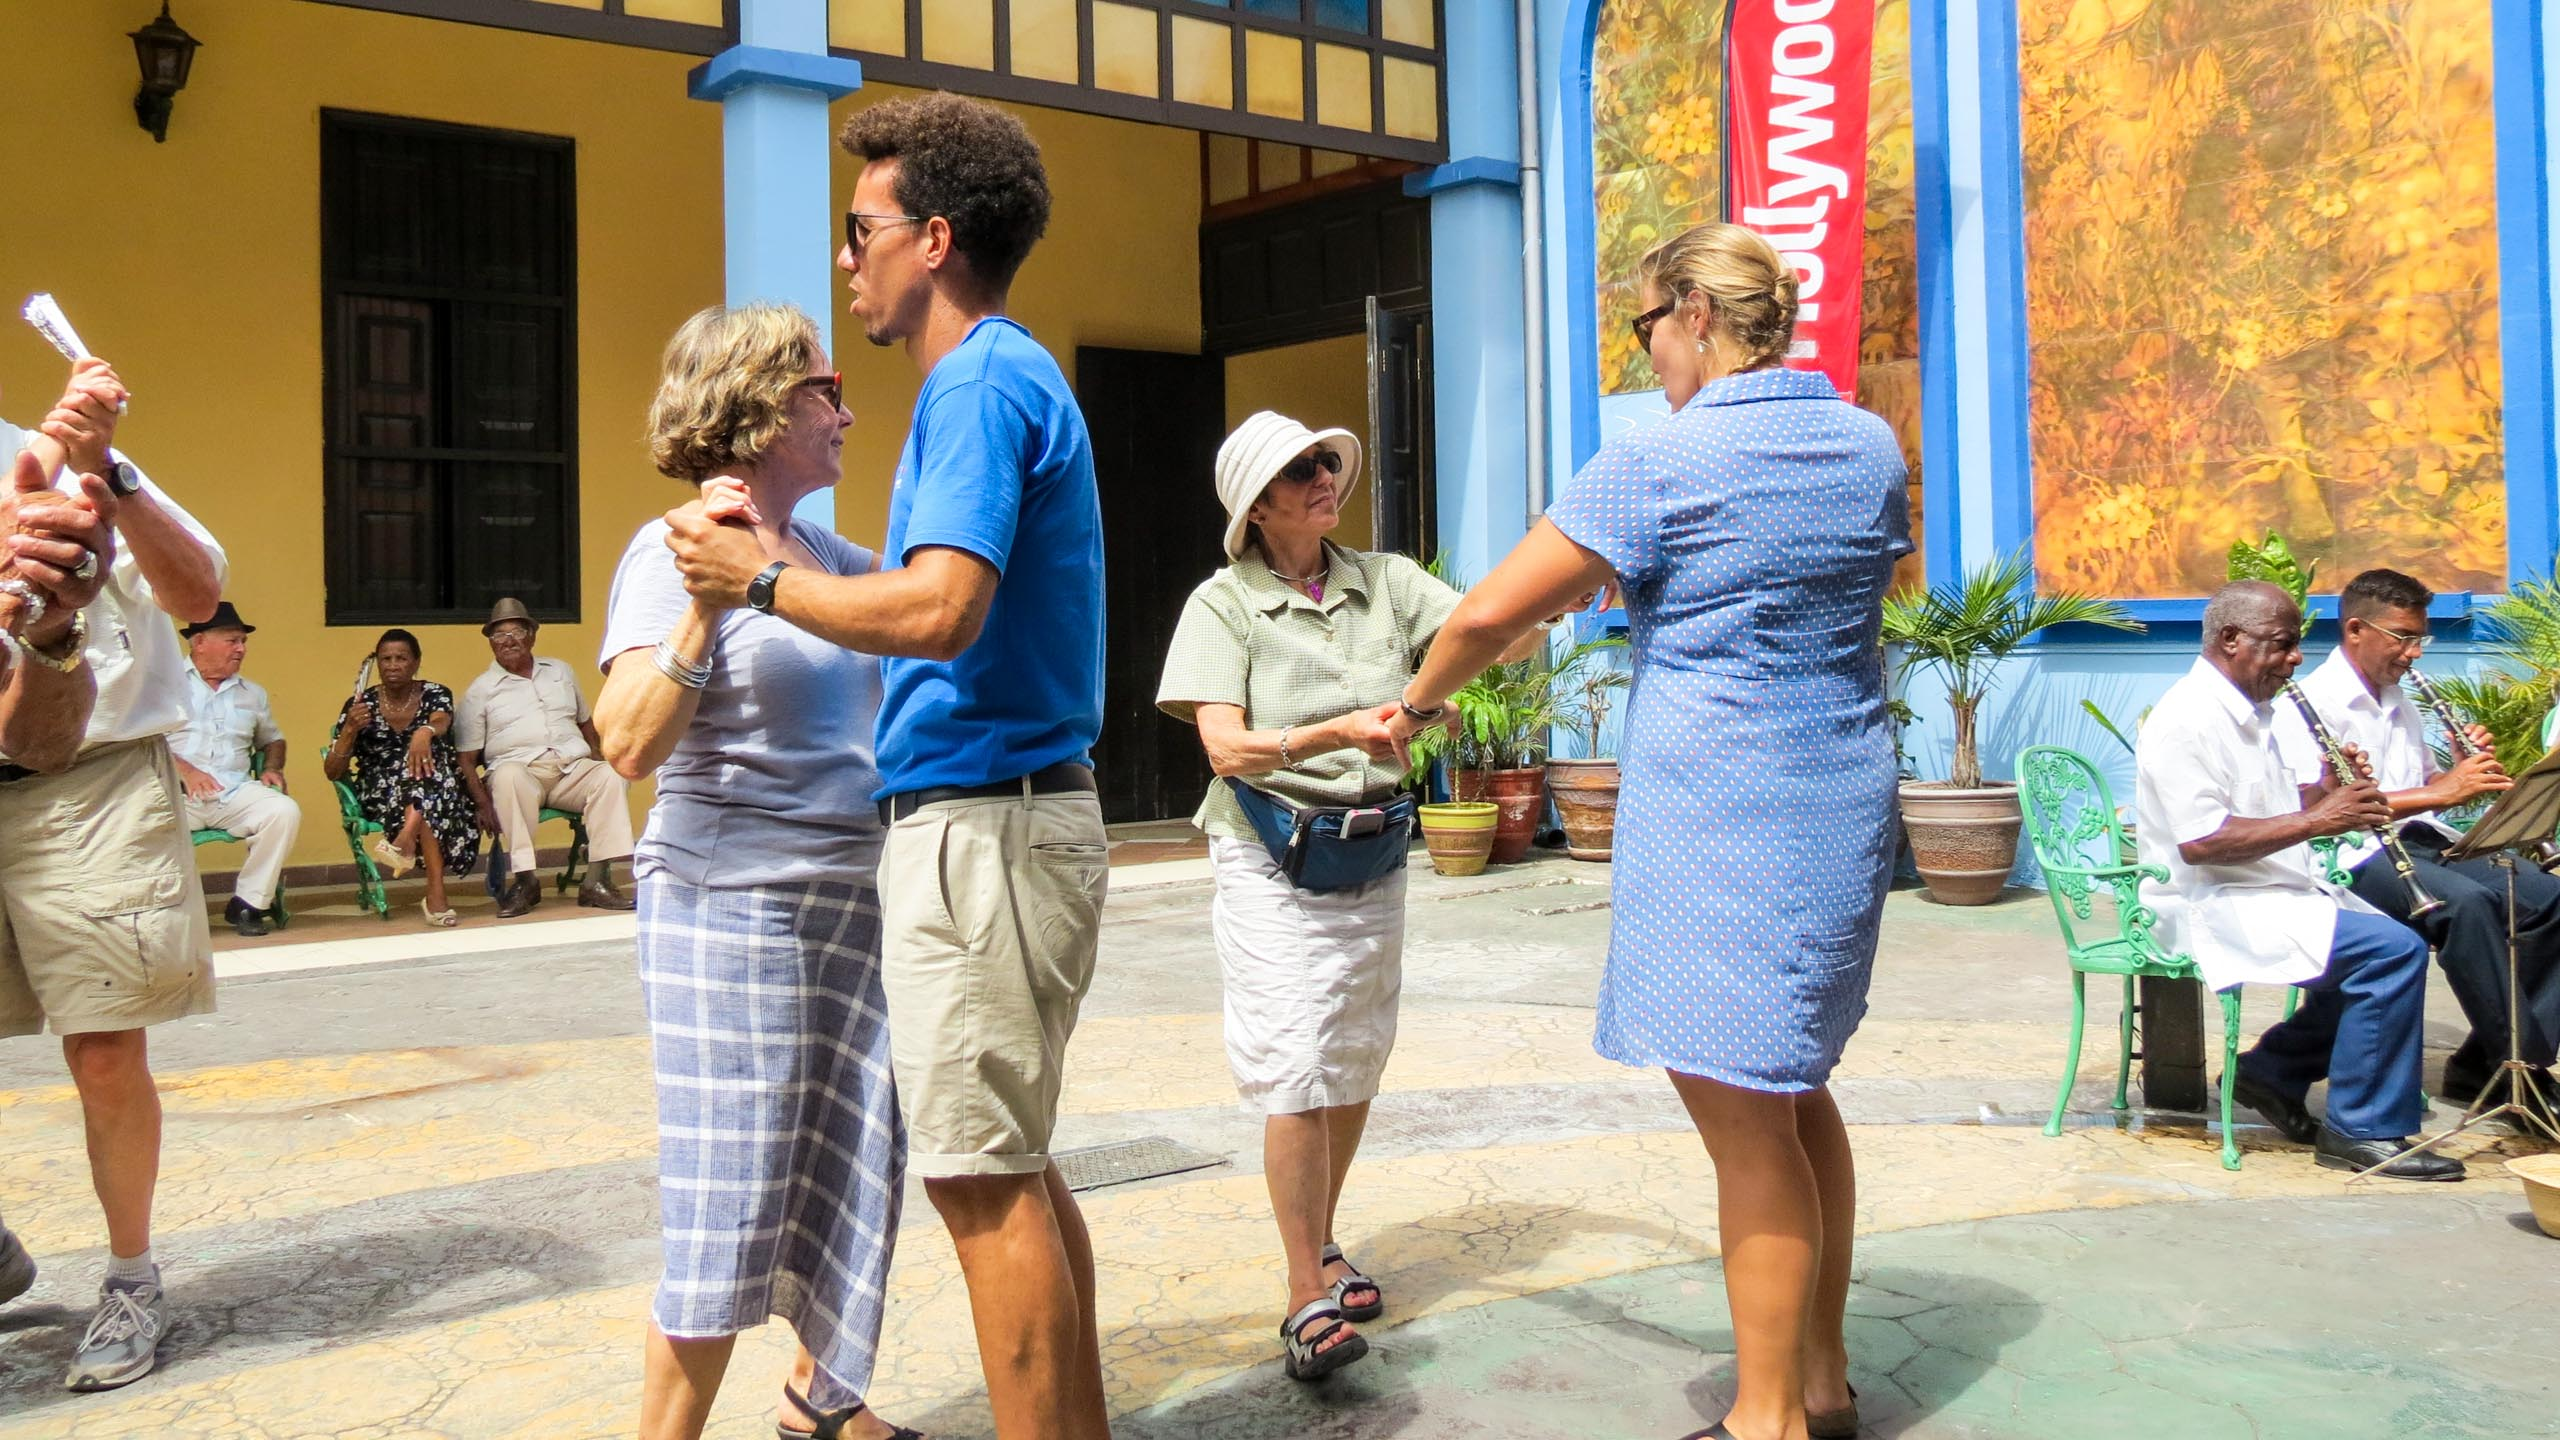 Travelers dance in Cuba